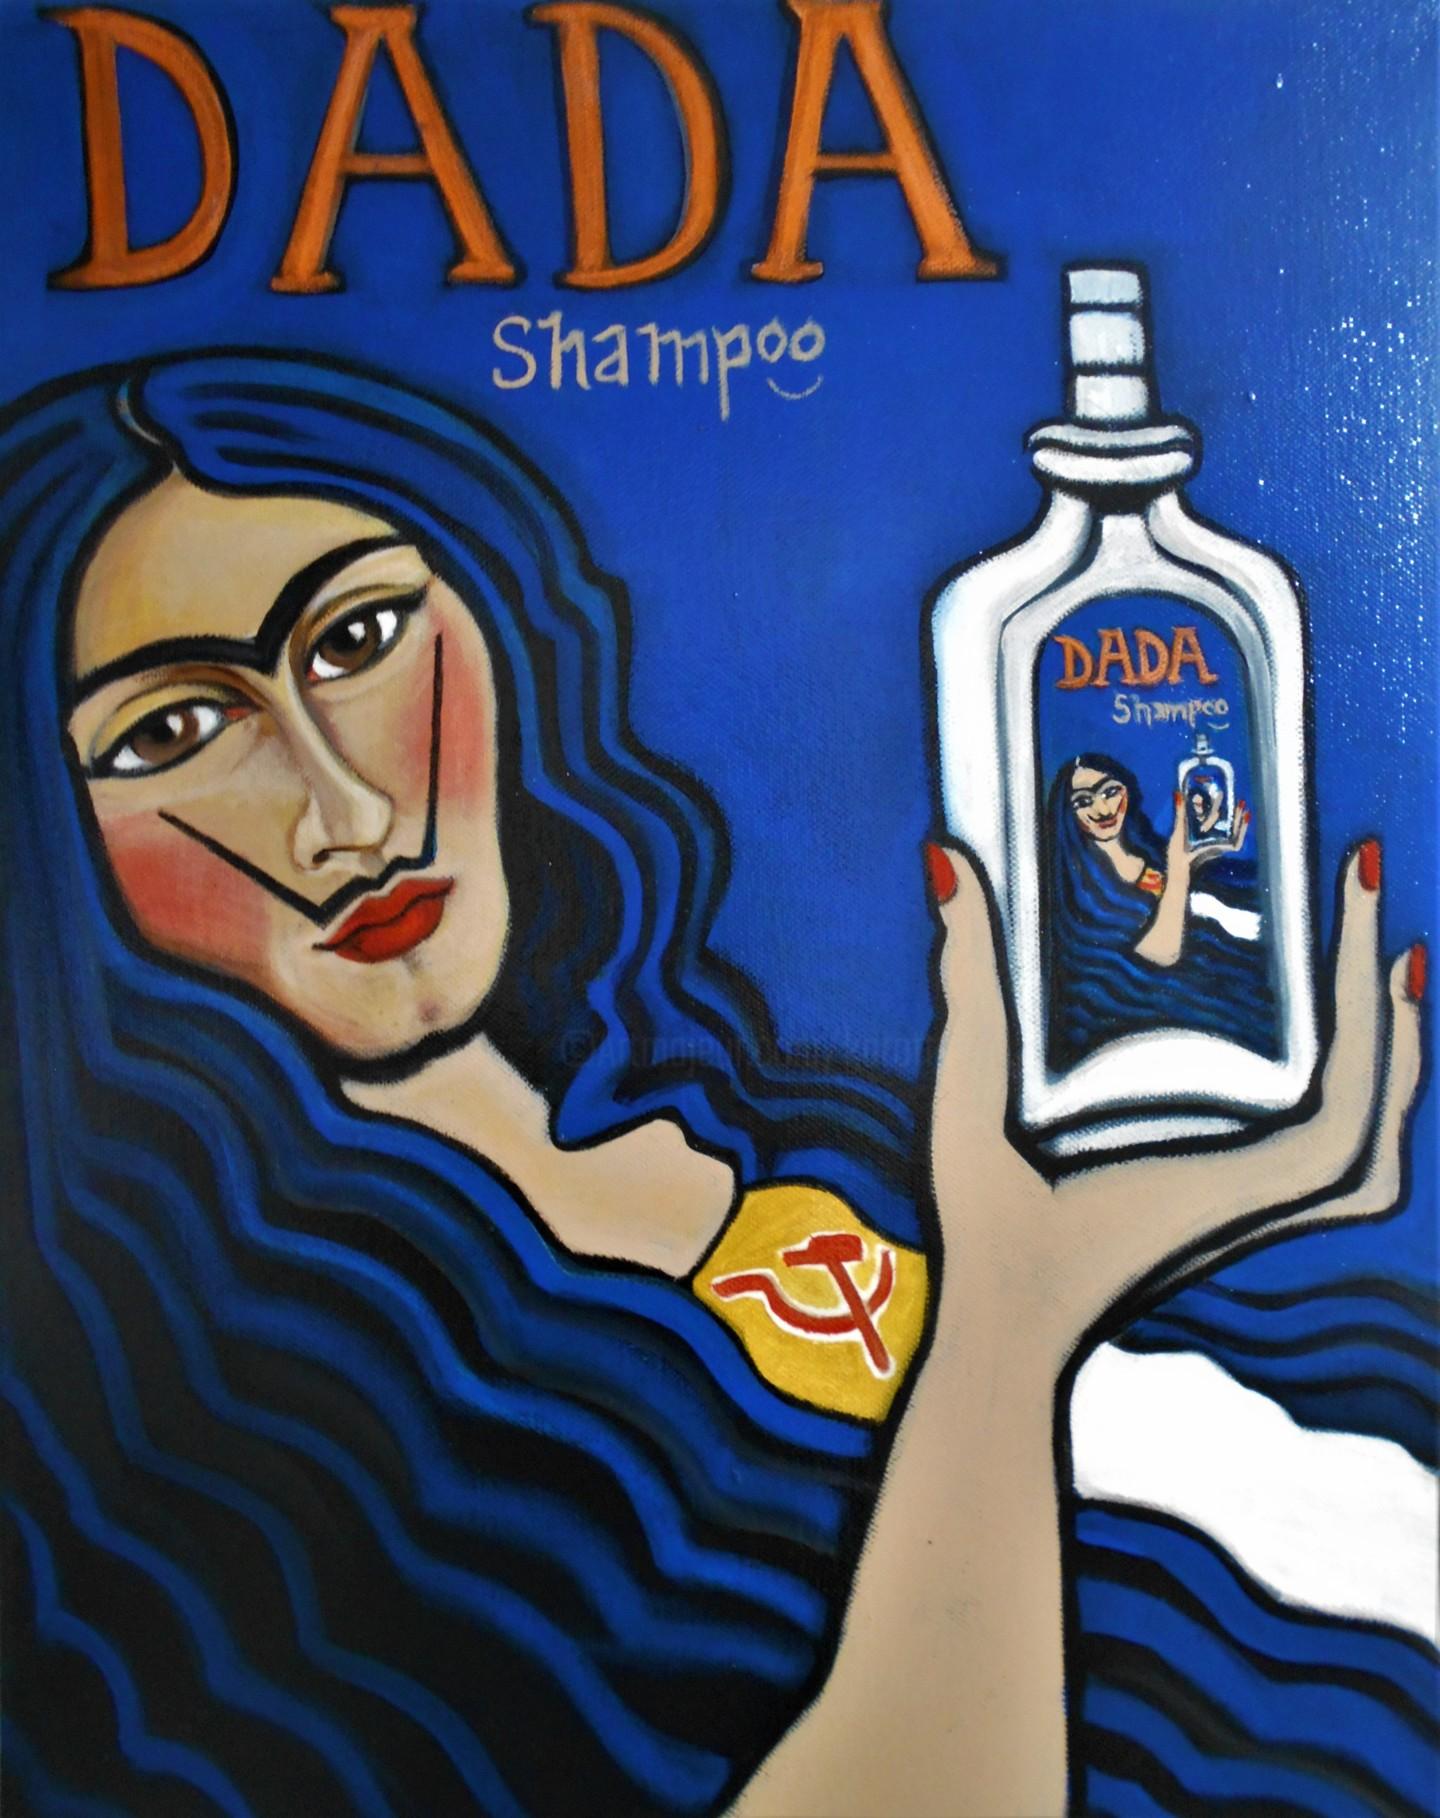 Karotte - Le shampoing dada